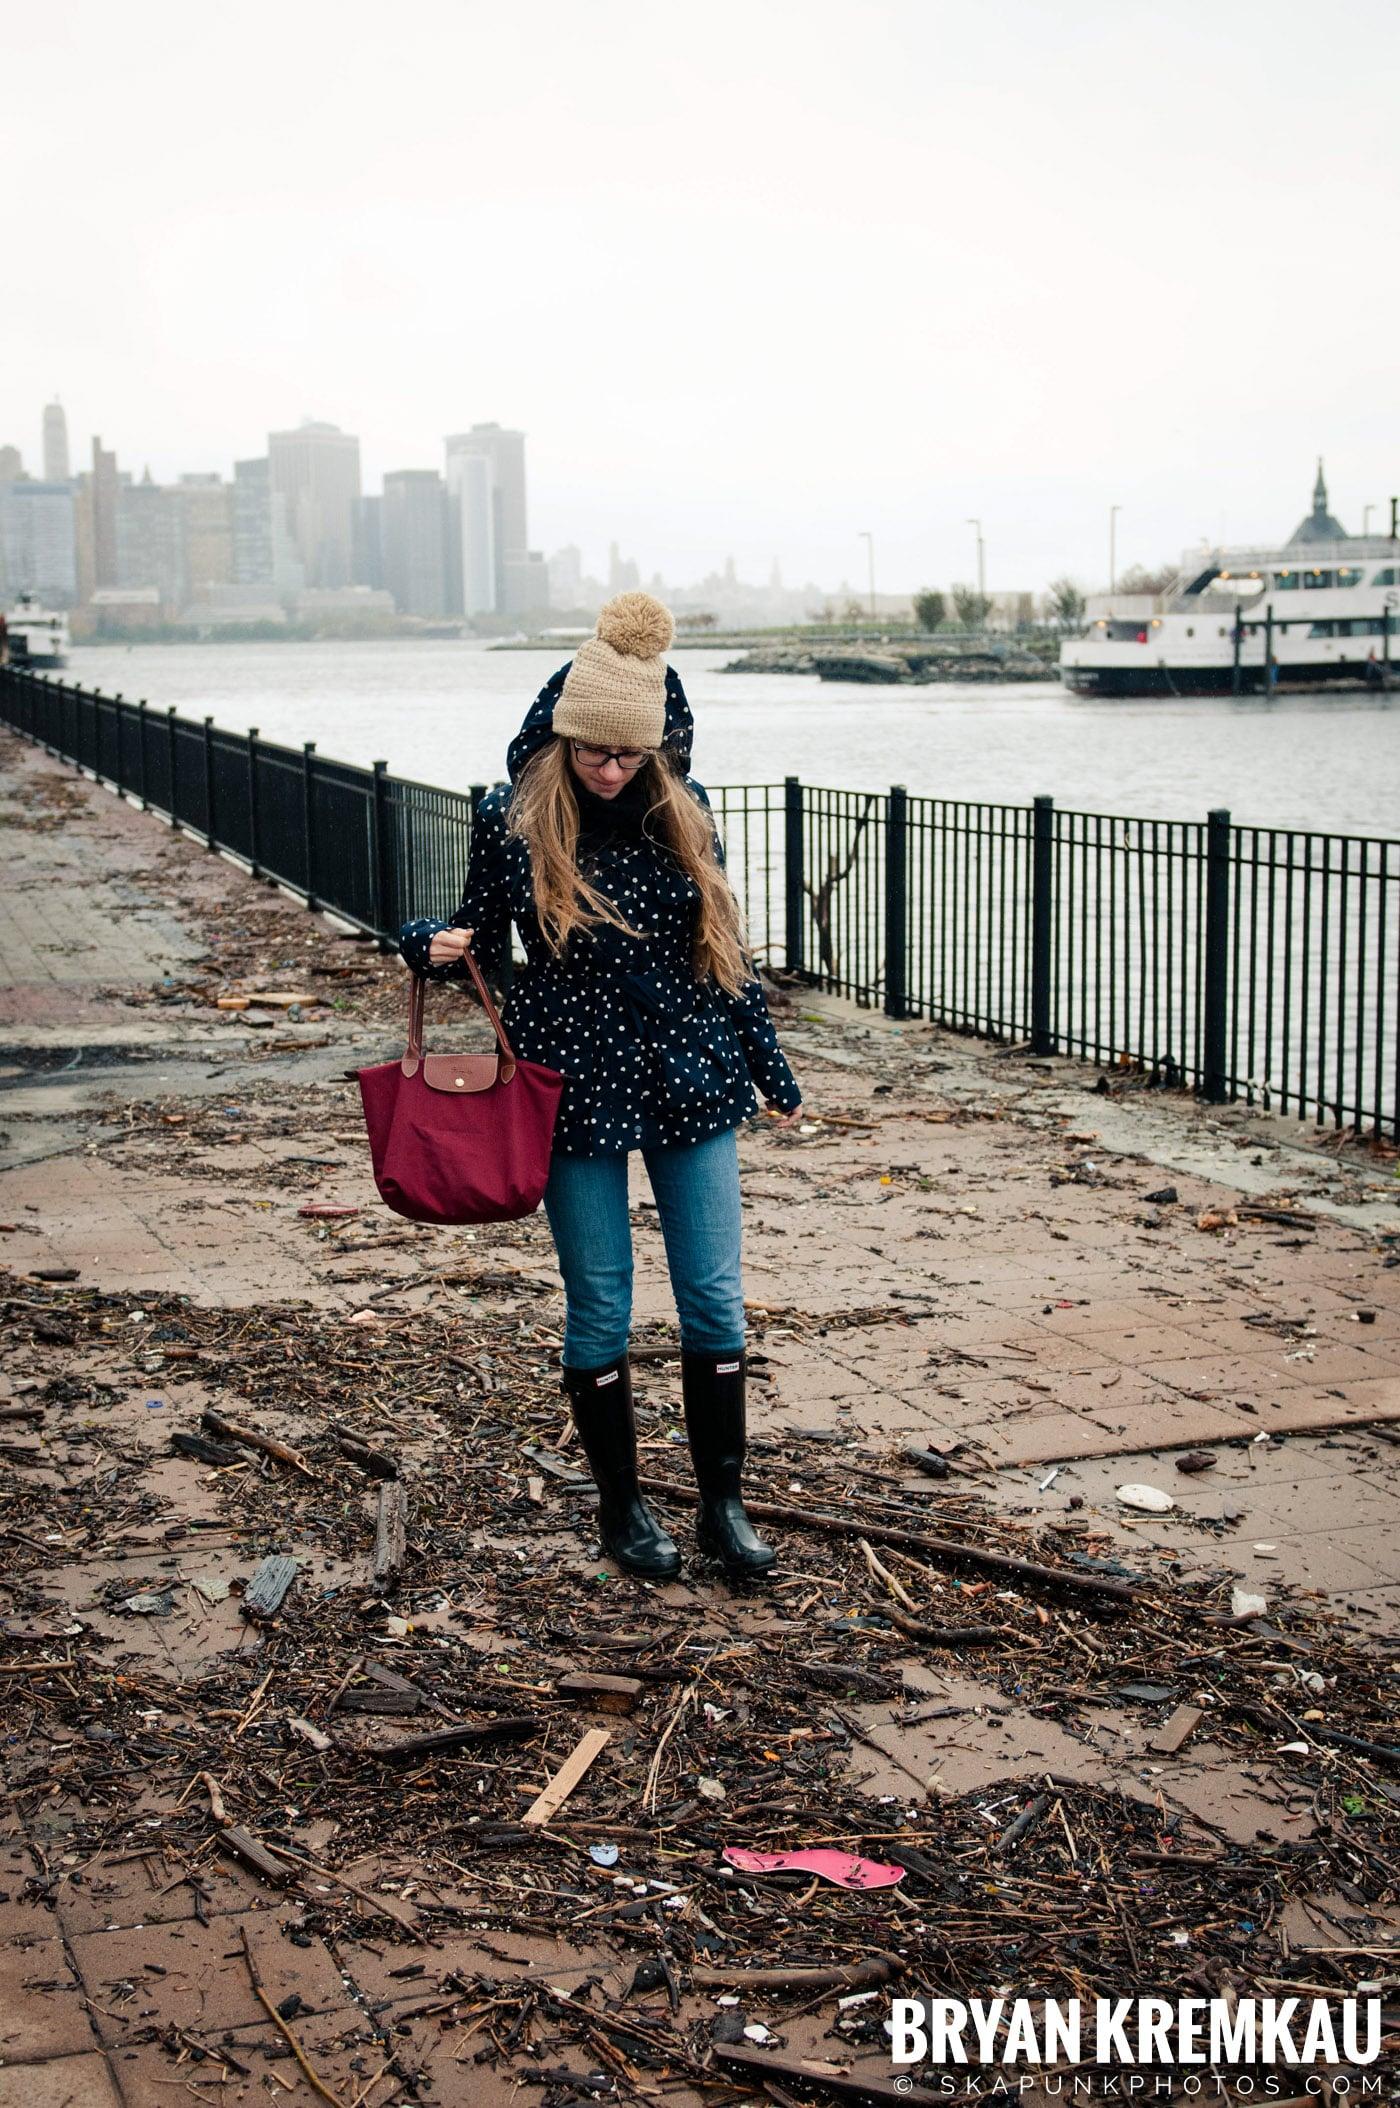 Hurricane Sandy 2012 @ Paulus Hook, Jersey City - 10.29.12 - 10.30.12 (22)